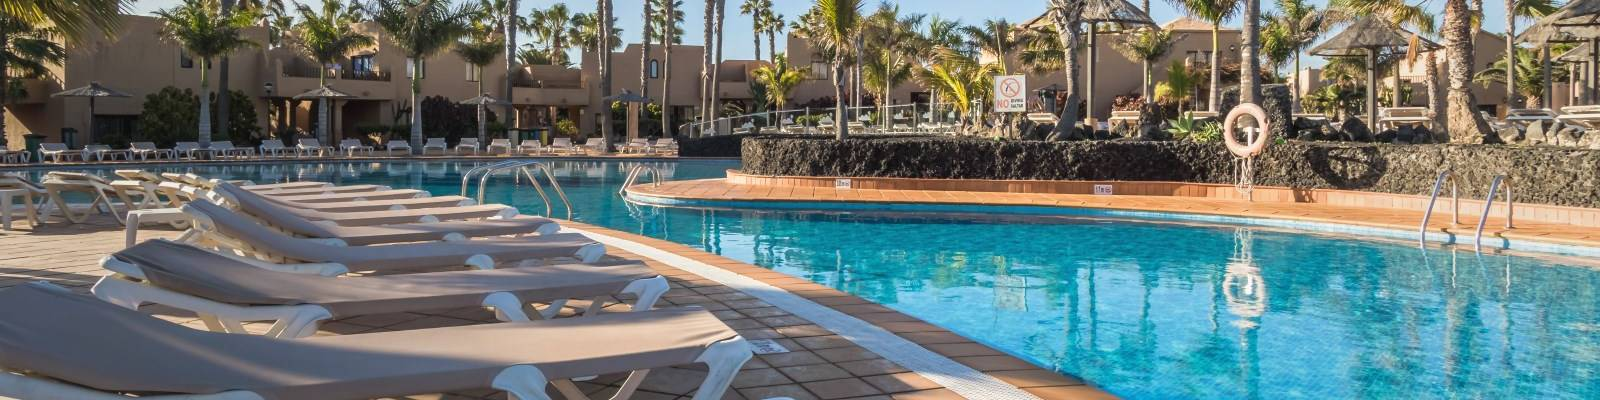 Hotel in Corralejo, Fuerteventura | Oasis Duna